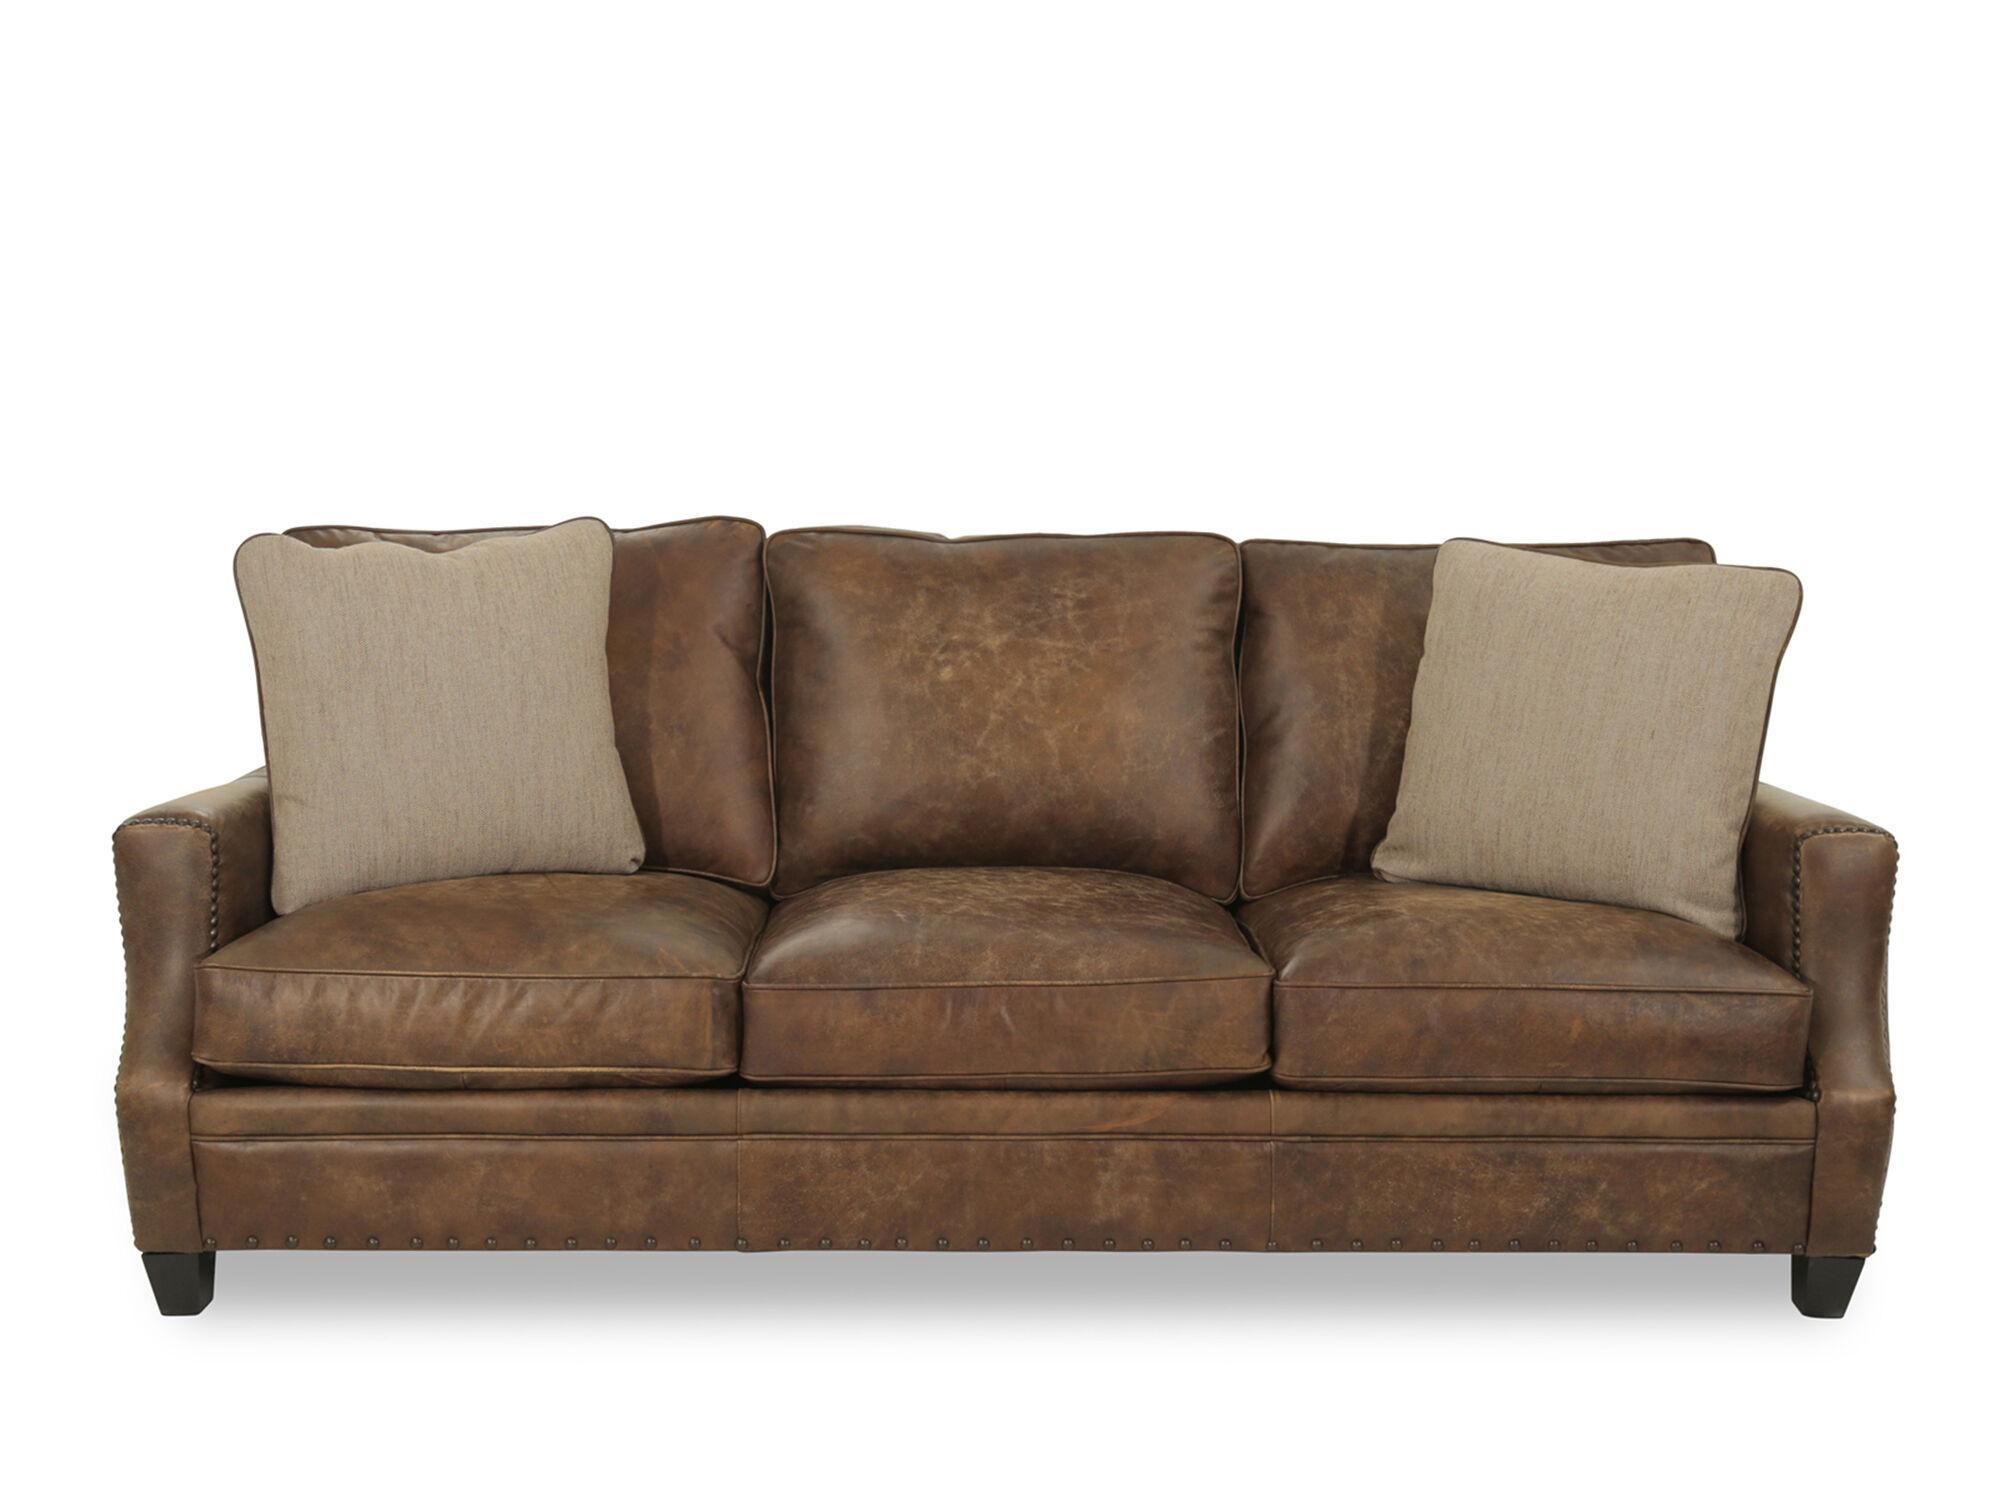 Bernhardt Barclay Leather Mocha Sofa